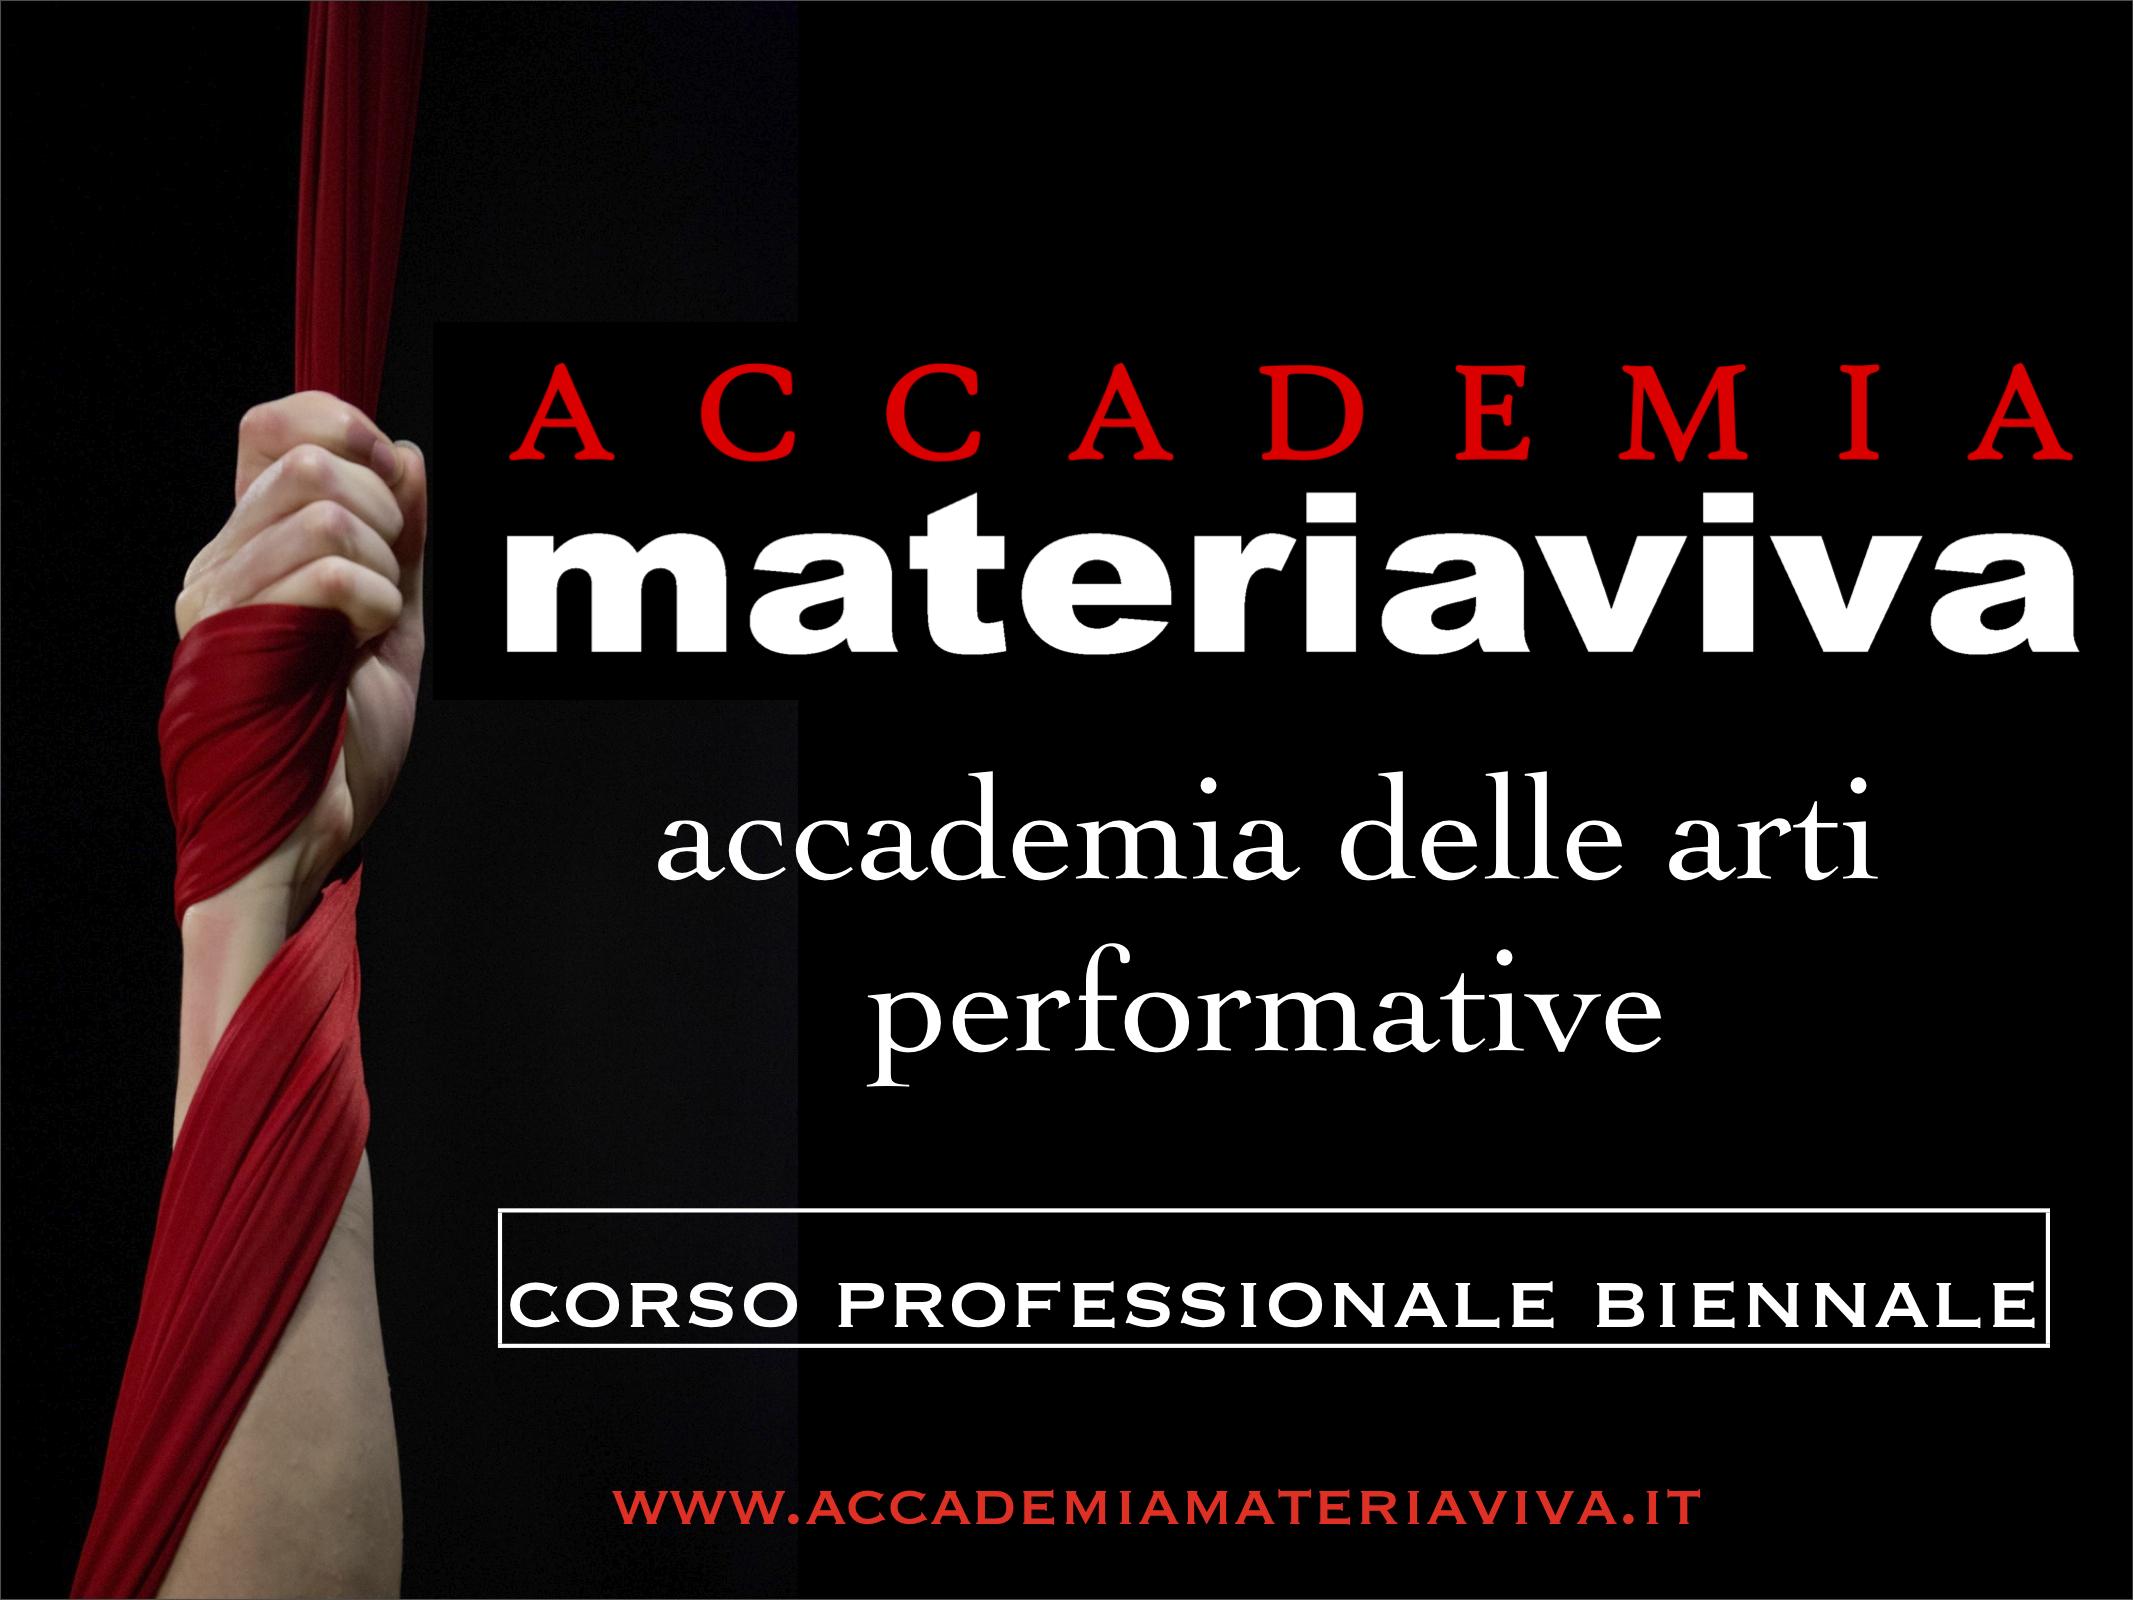 Accademia Materiaviva